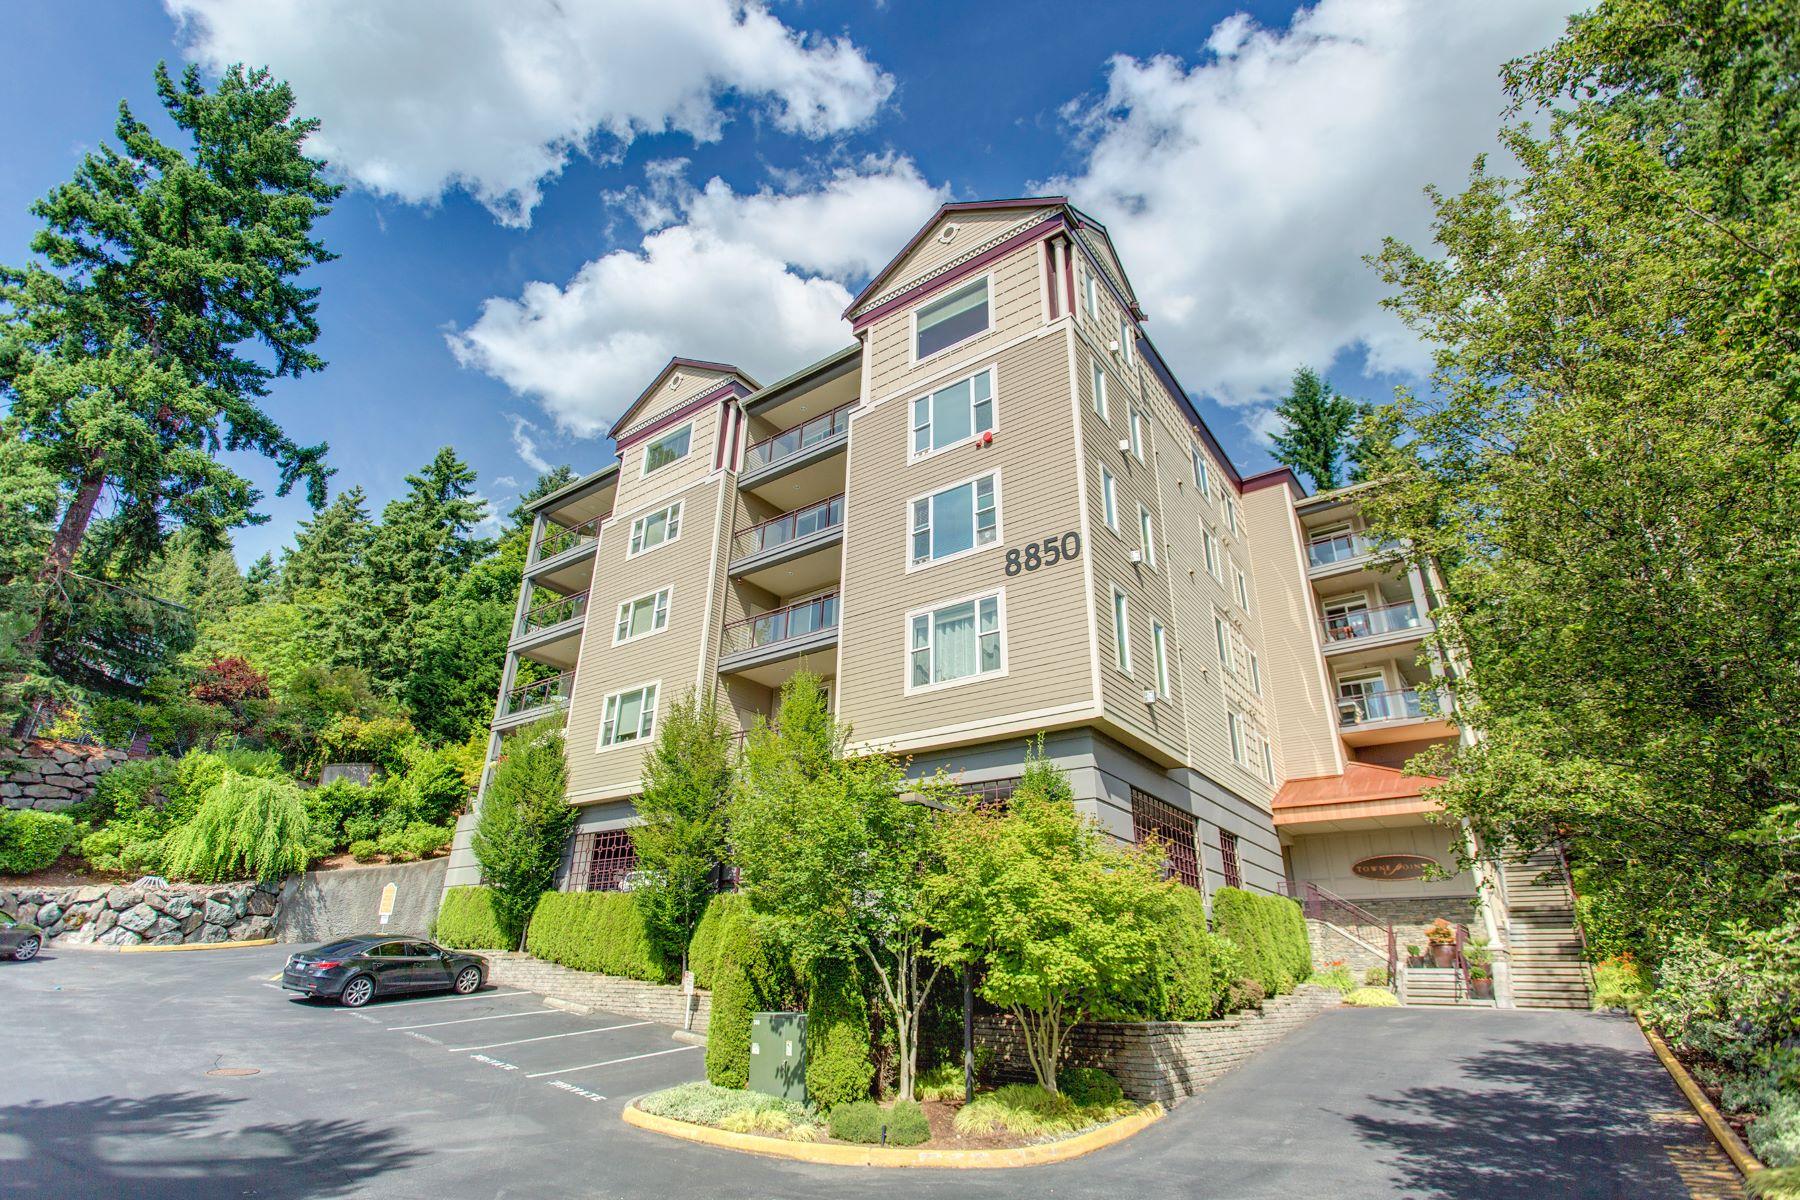 Condominiums for Sale at 8850 164th Avenue Northeast #403, Redmond, WA 98052 8850 164th Ave NE #403 Redmond, Washington 98052 United States